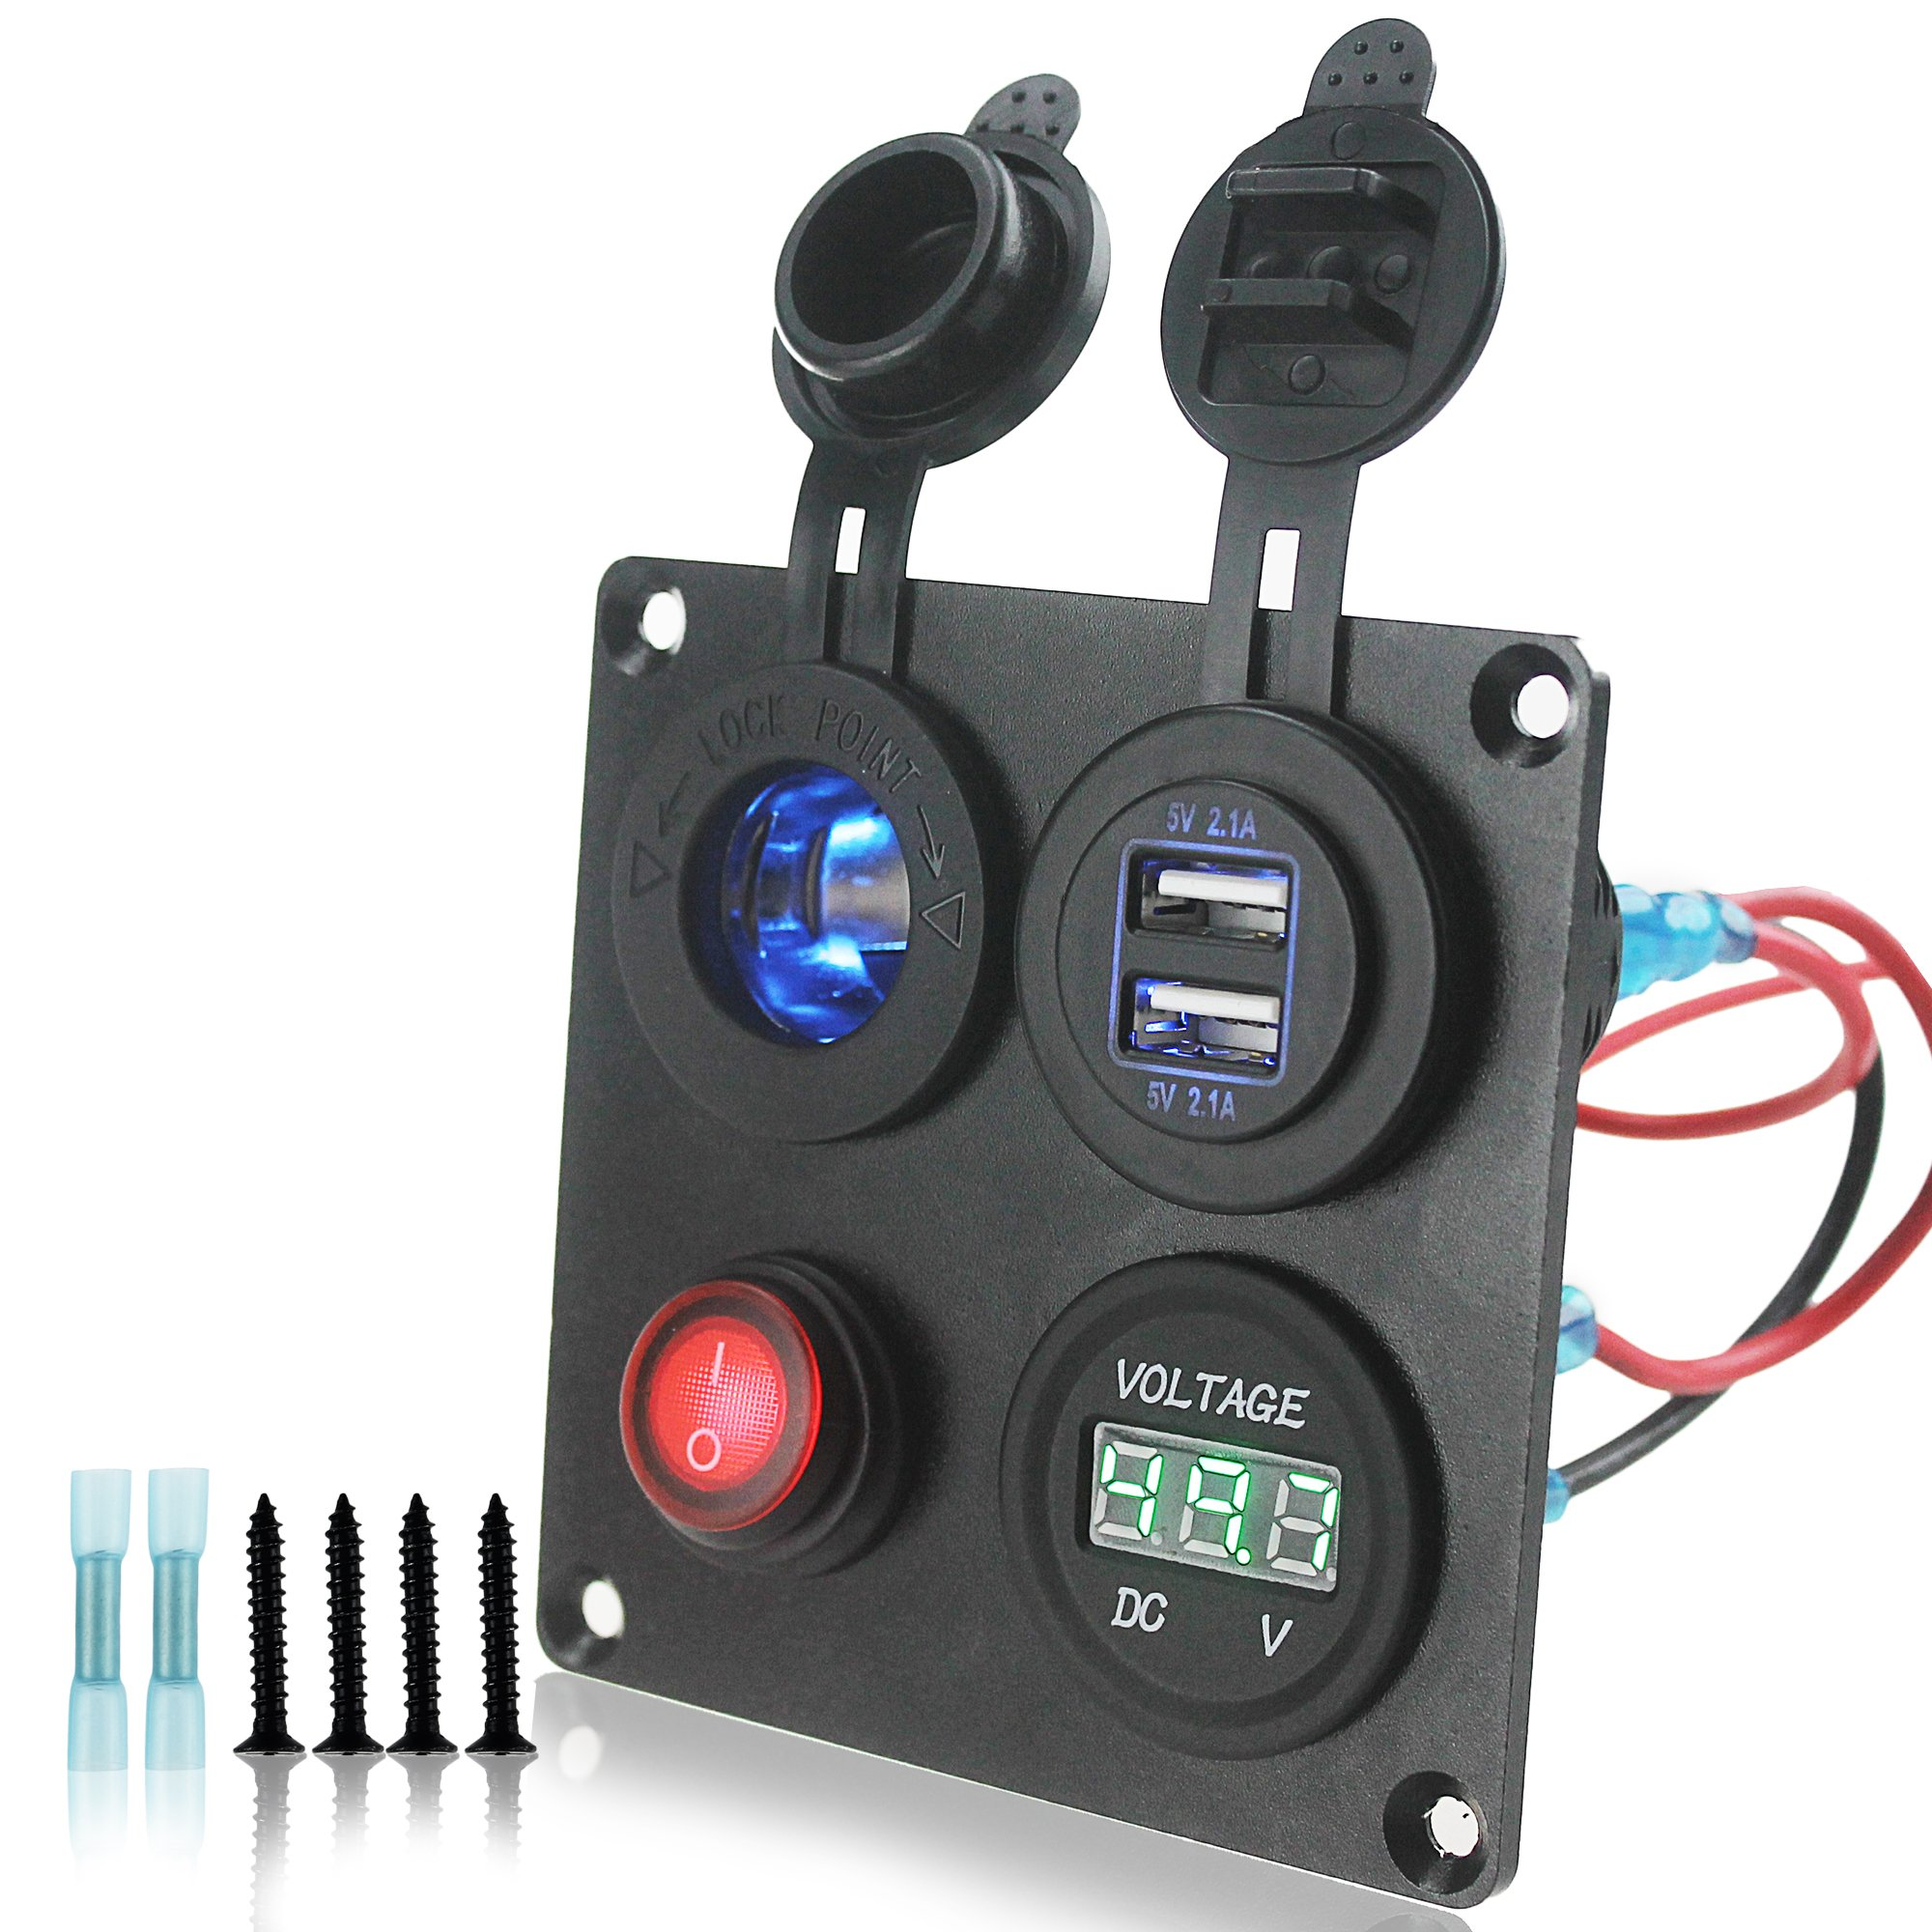 Iztoss 12-24V Green Voltmeter led Cigarette Lighter 4.2 Dual USB Adapter Charger Switch 4 Hole Aluminum Panel Plate Truck Boat Marine Trailer